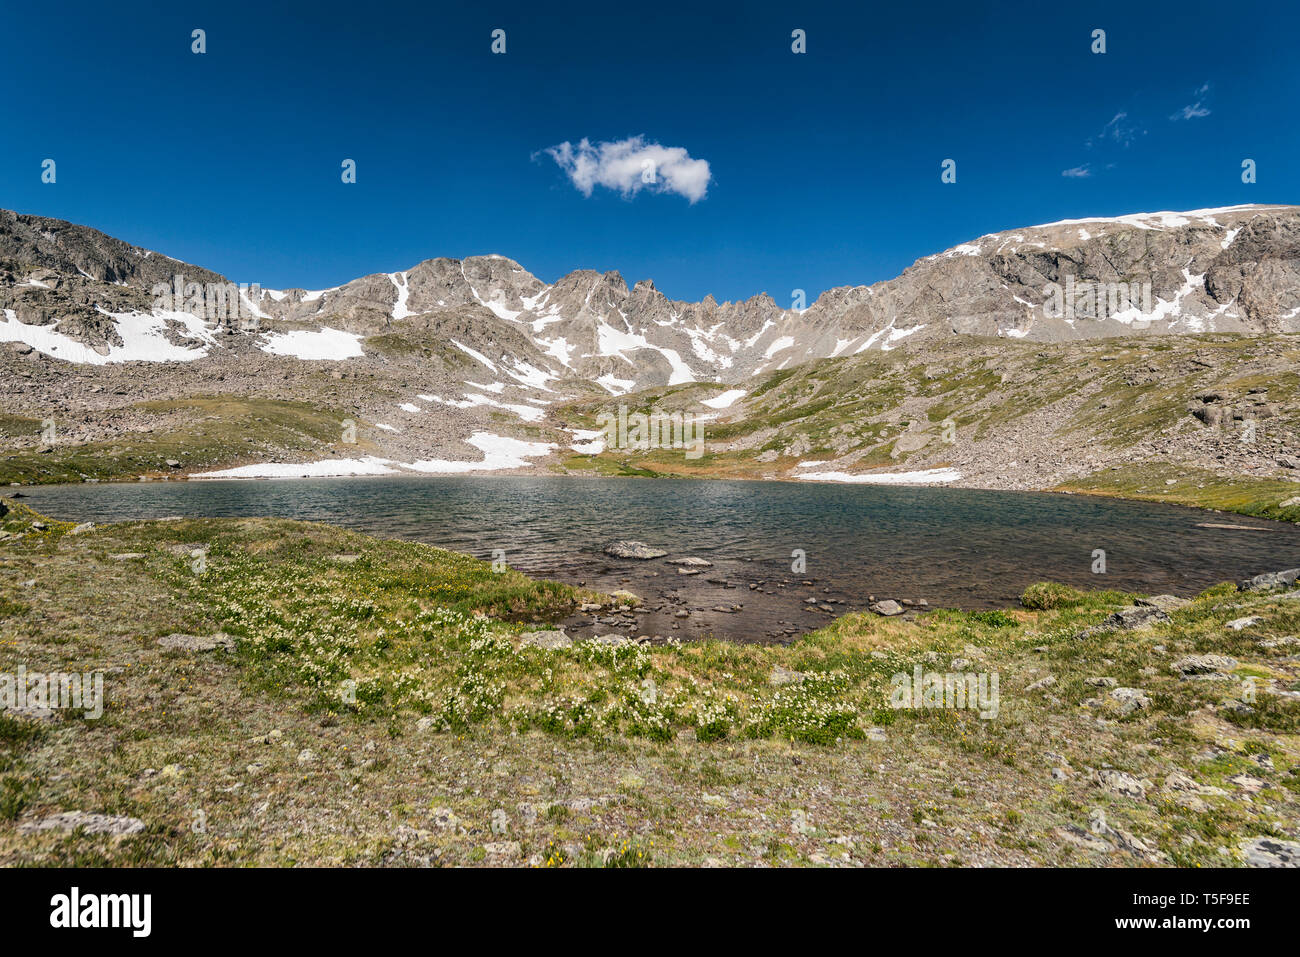 High altitude lake in Colorado - Stock Image